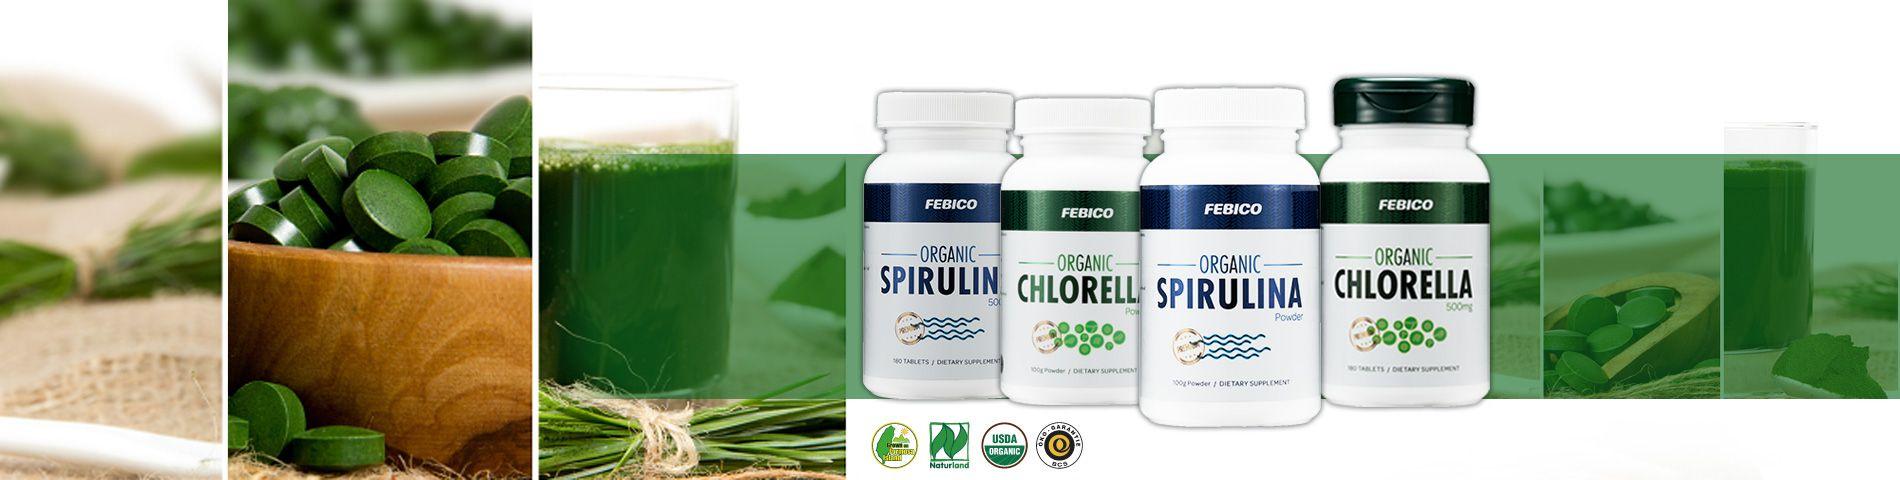 The highest quality Organic Superfoods Microalgae Producer